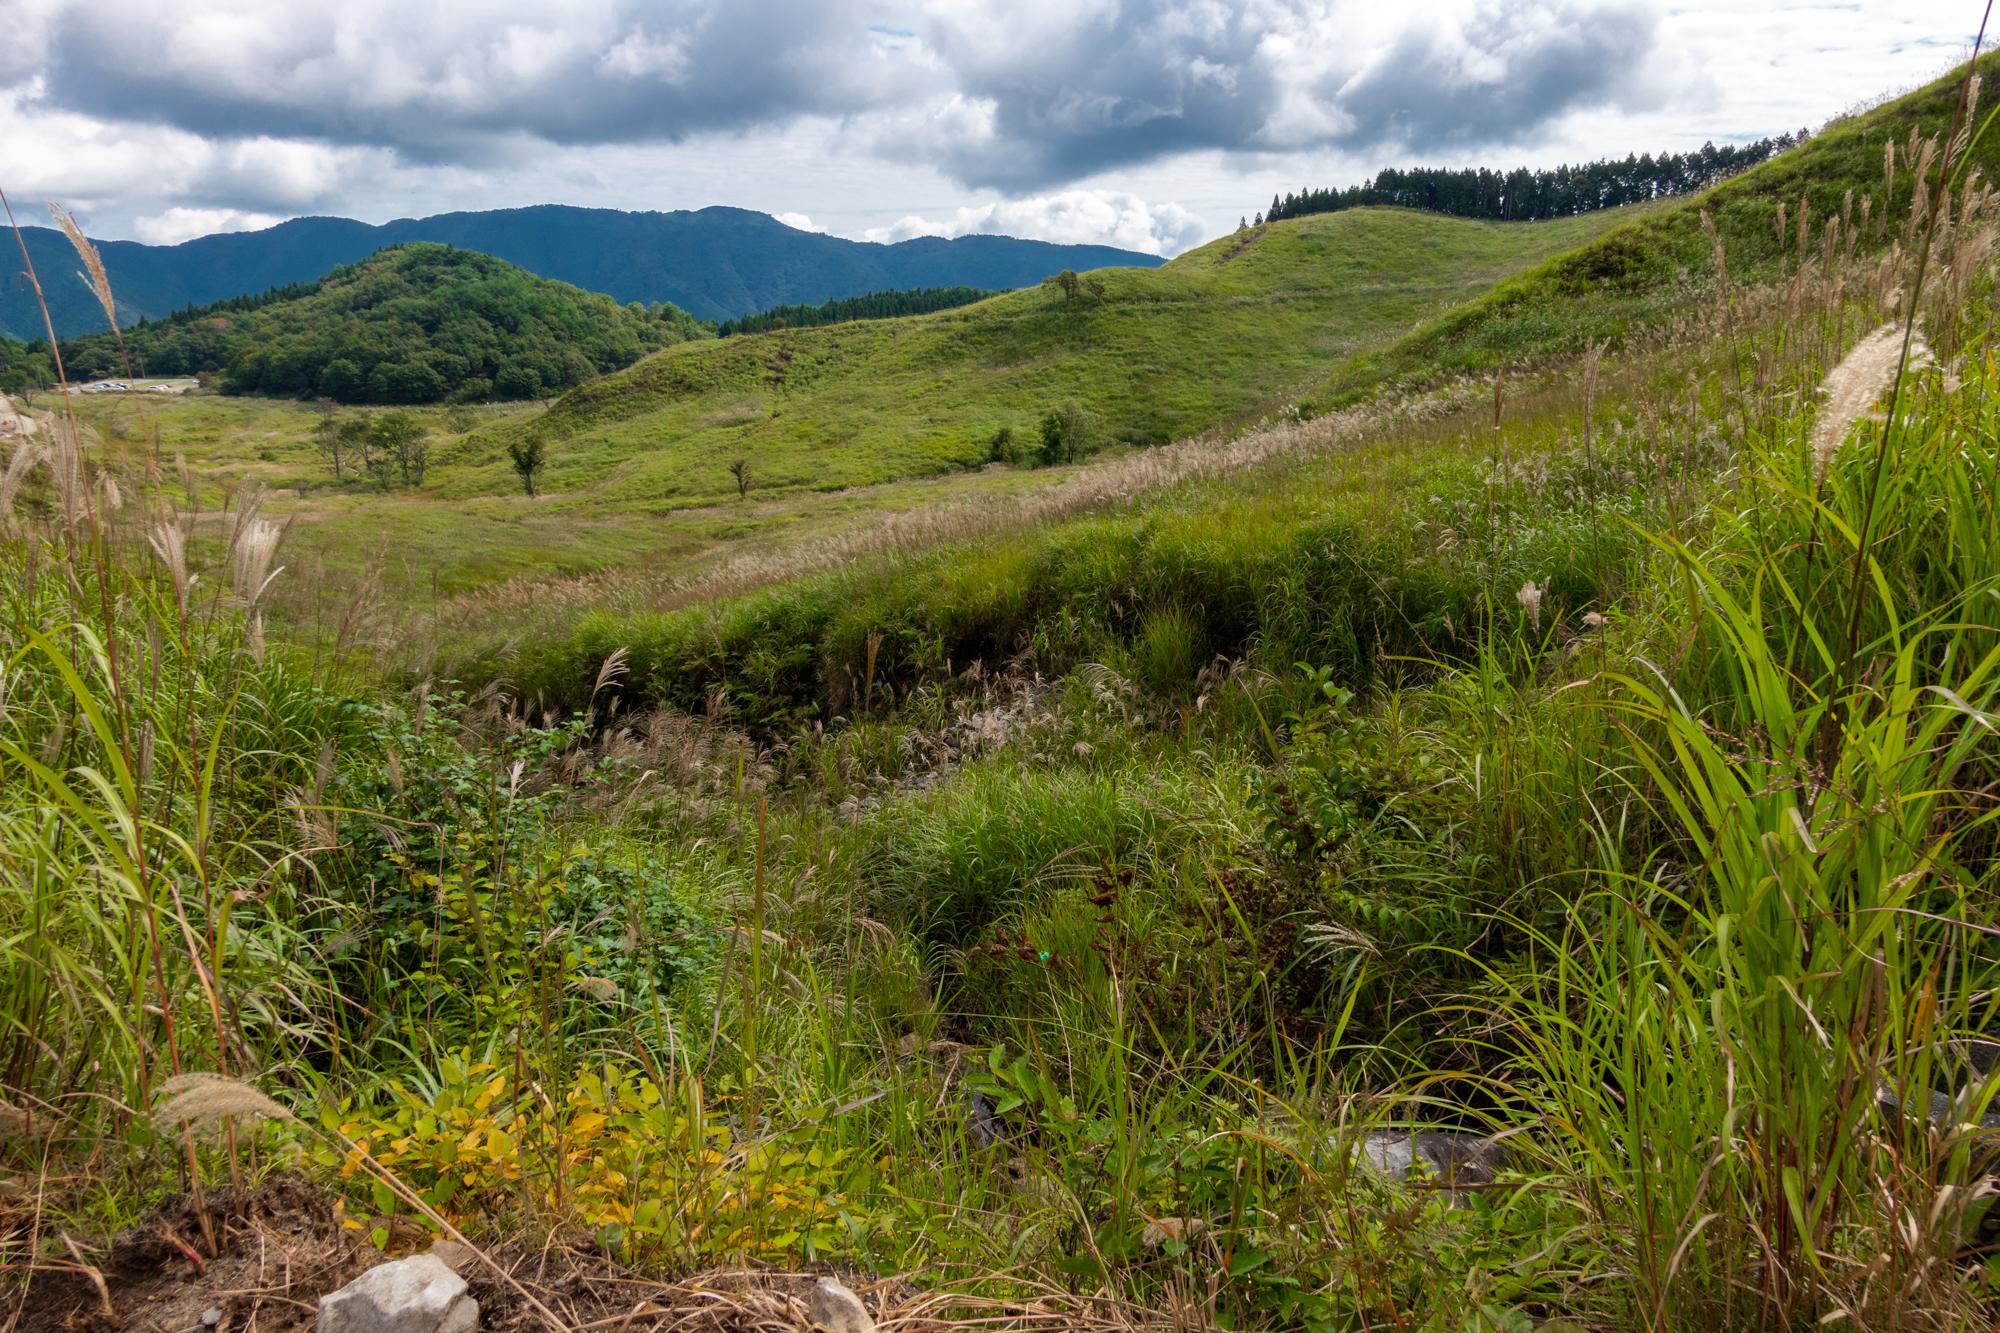 DSC02148 兵庫県 砥峰高原( 一面ススキの草原が広がる絶景の高原写真スポット!撮影した写真の紹介、 アクセス情報や撮影ポイントなど!)